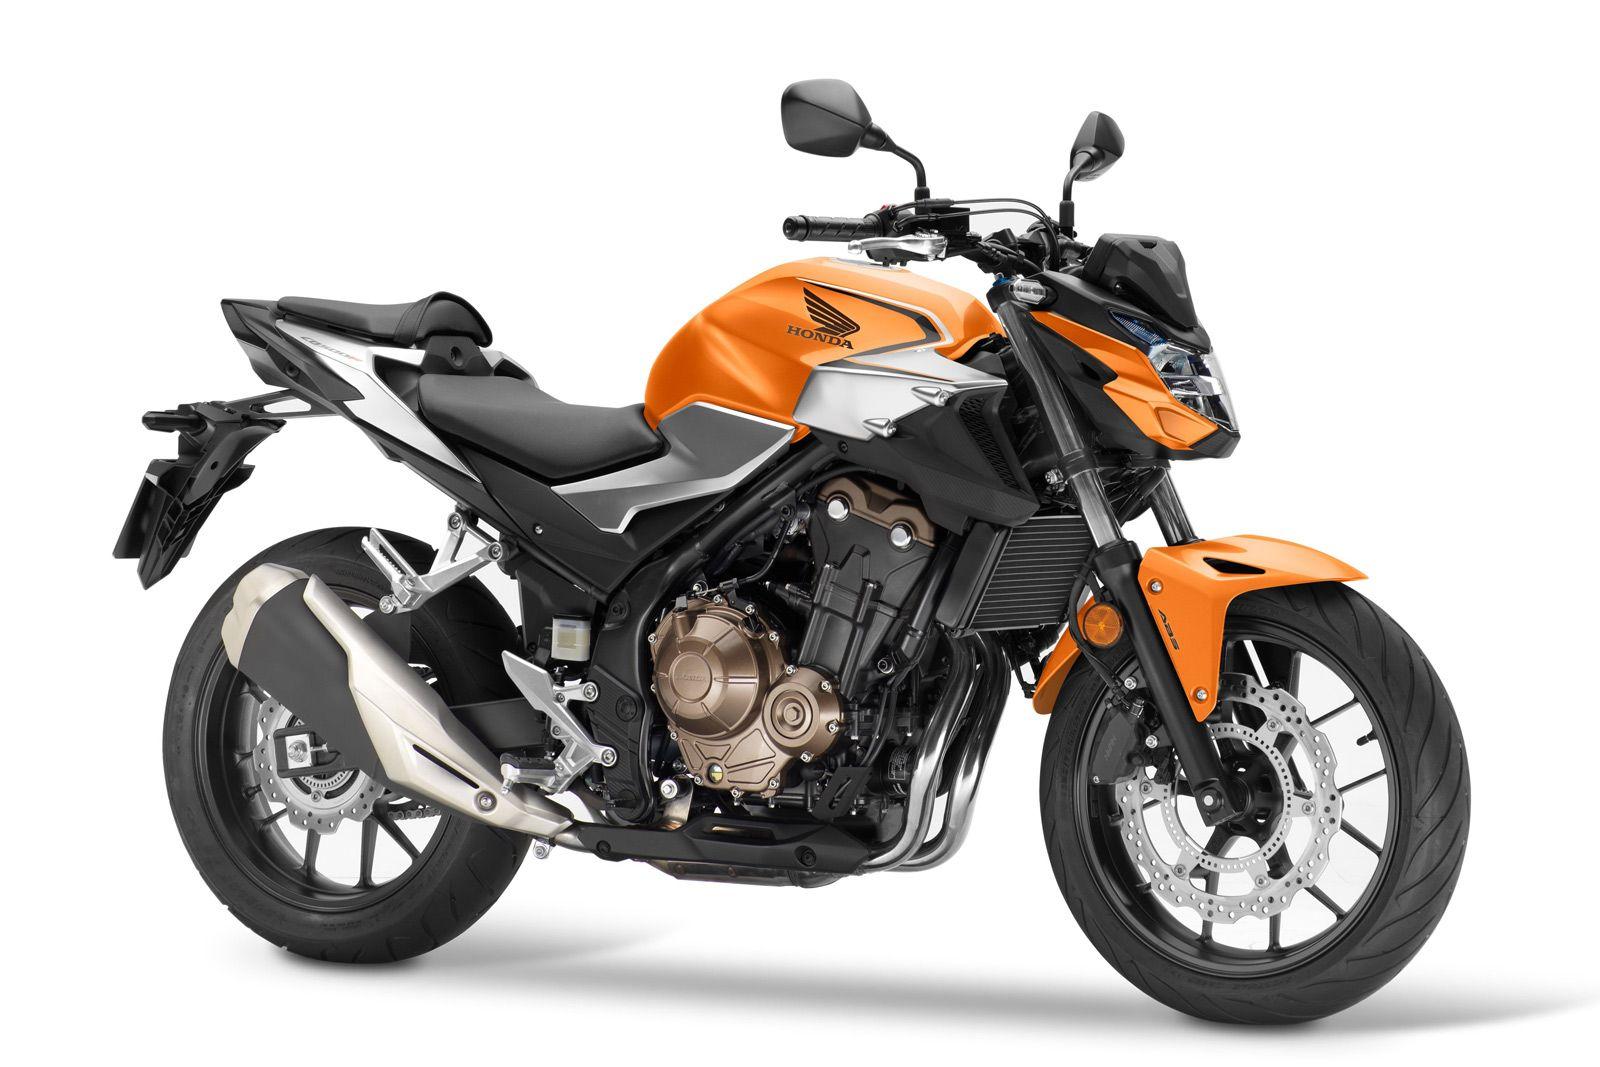 Honda CB 500 F - Honda CB500F - Moto / Motorcycle - Centre